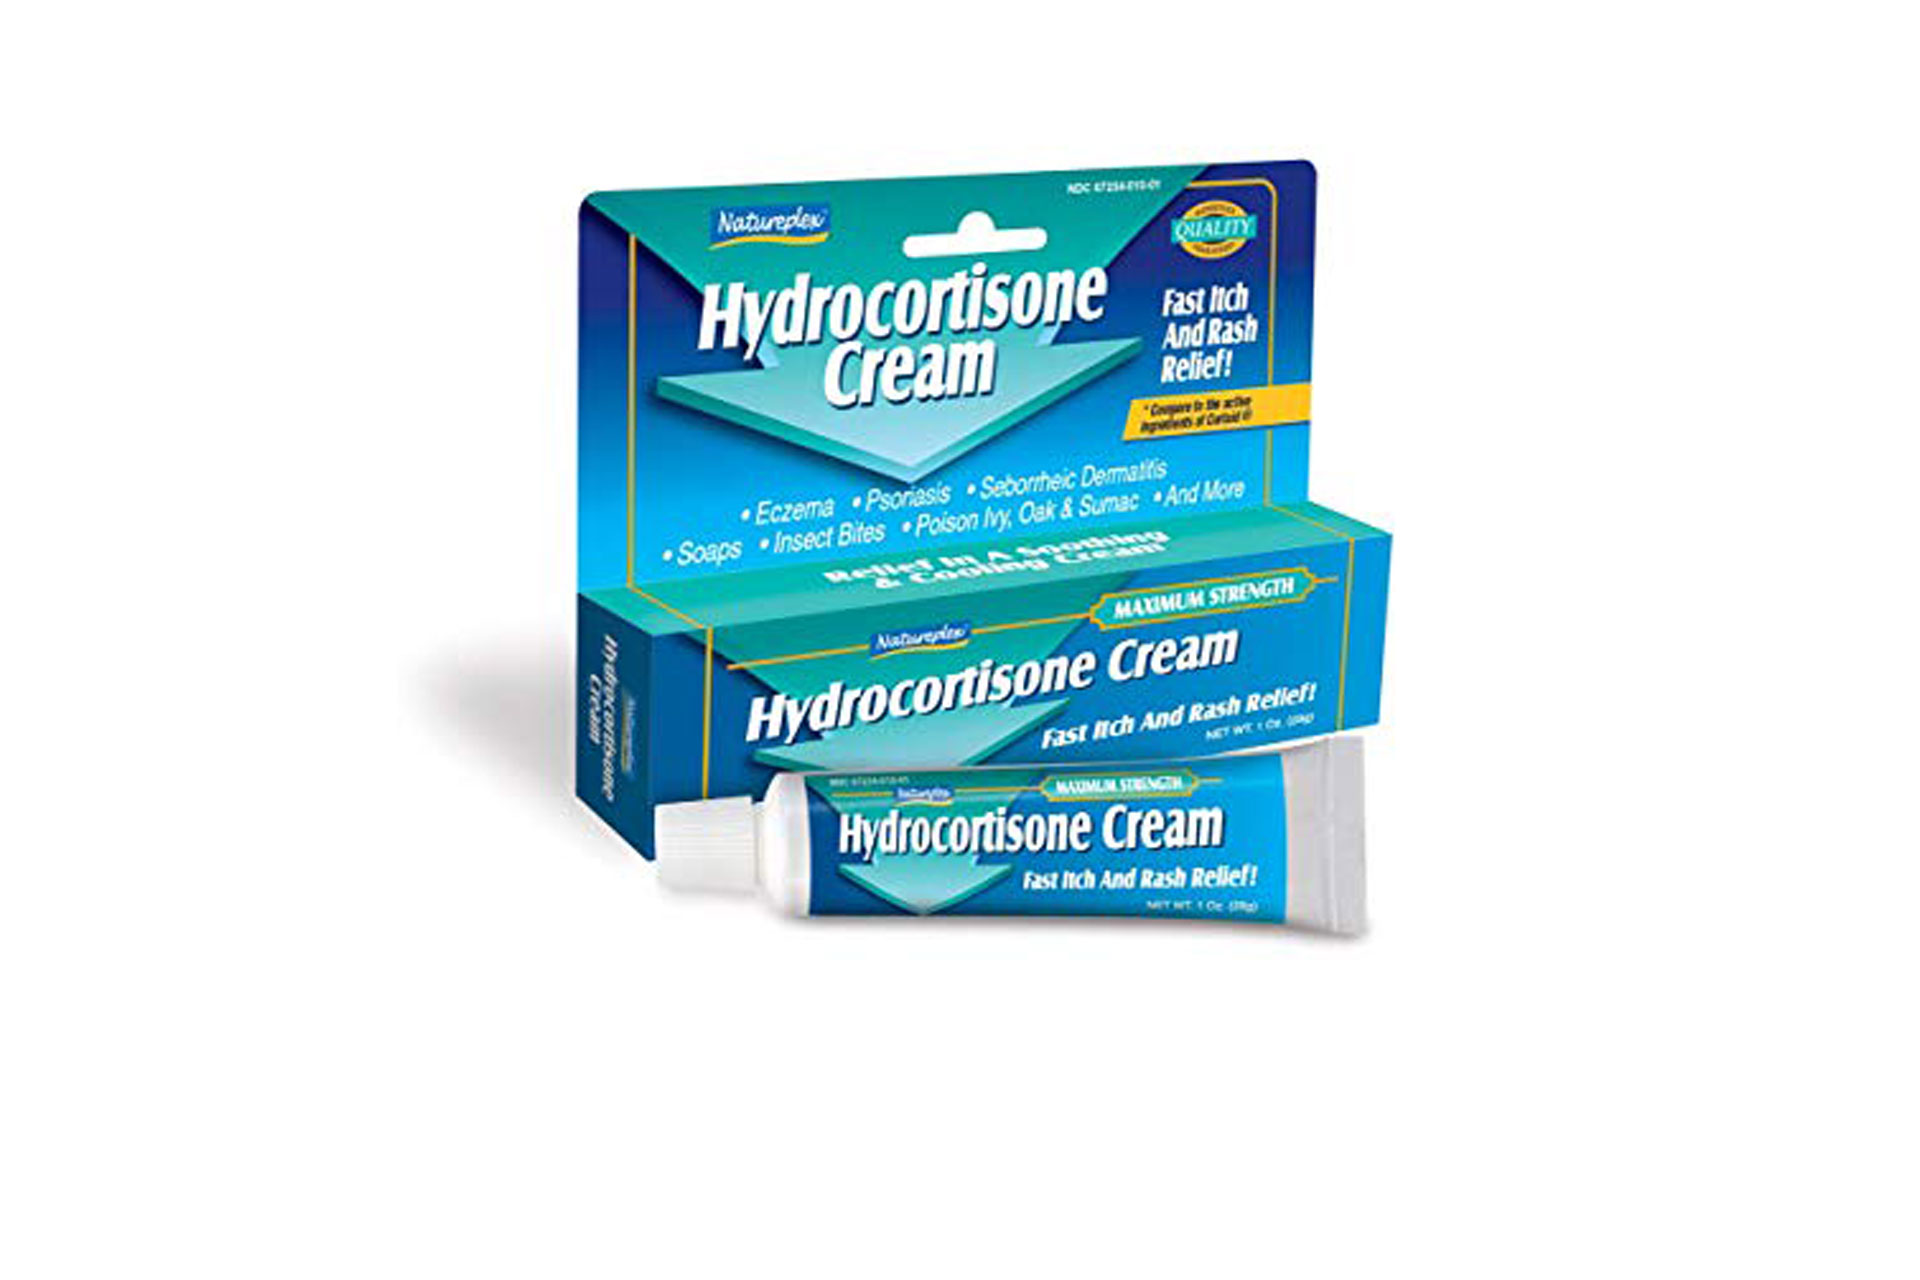 Hydrocortisone Cream; Courtesy of Amazon